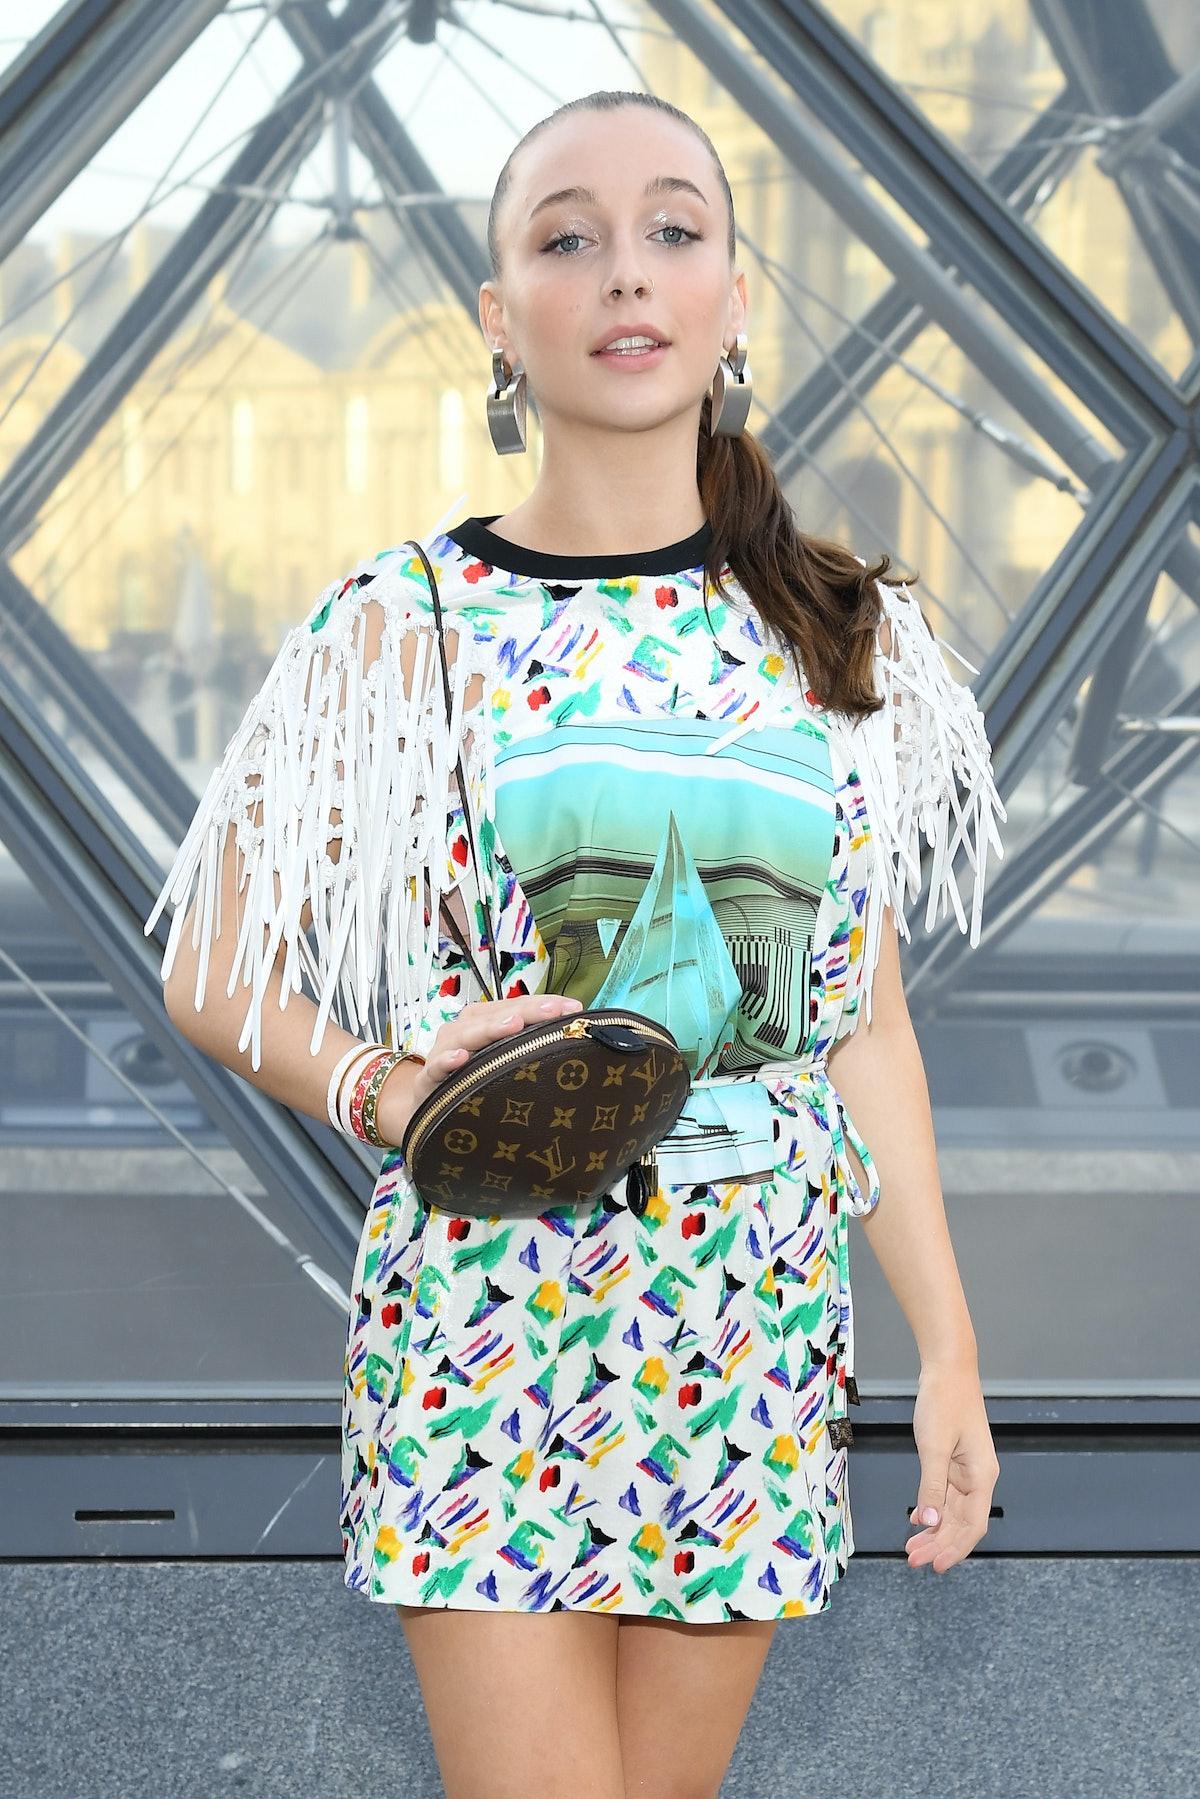 PARIS, FRANCE - MARCH 05: Emma Chamberlain attends the Louis Vuitton show as part of the Paris Fashi...